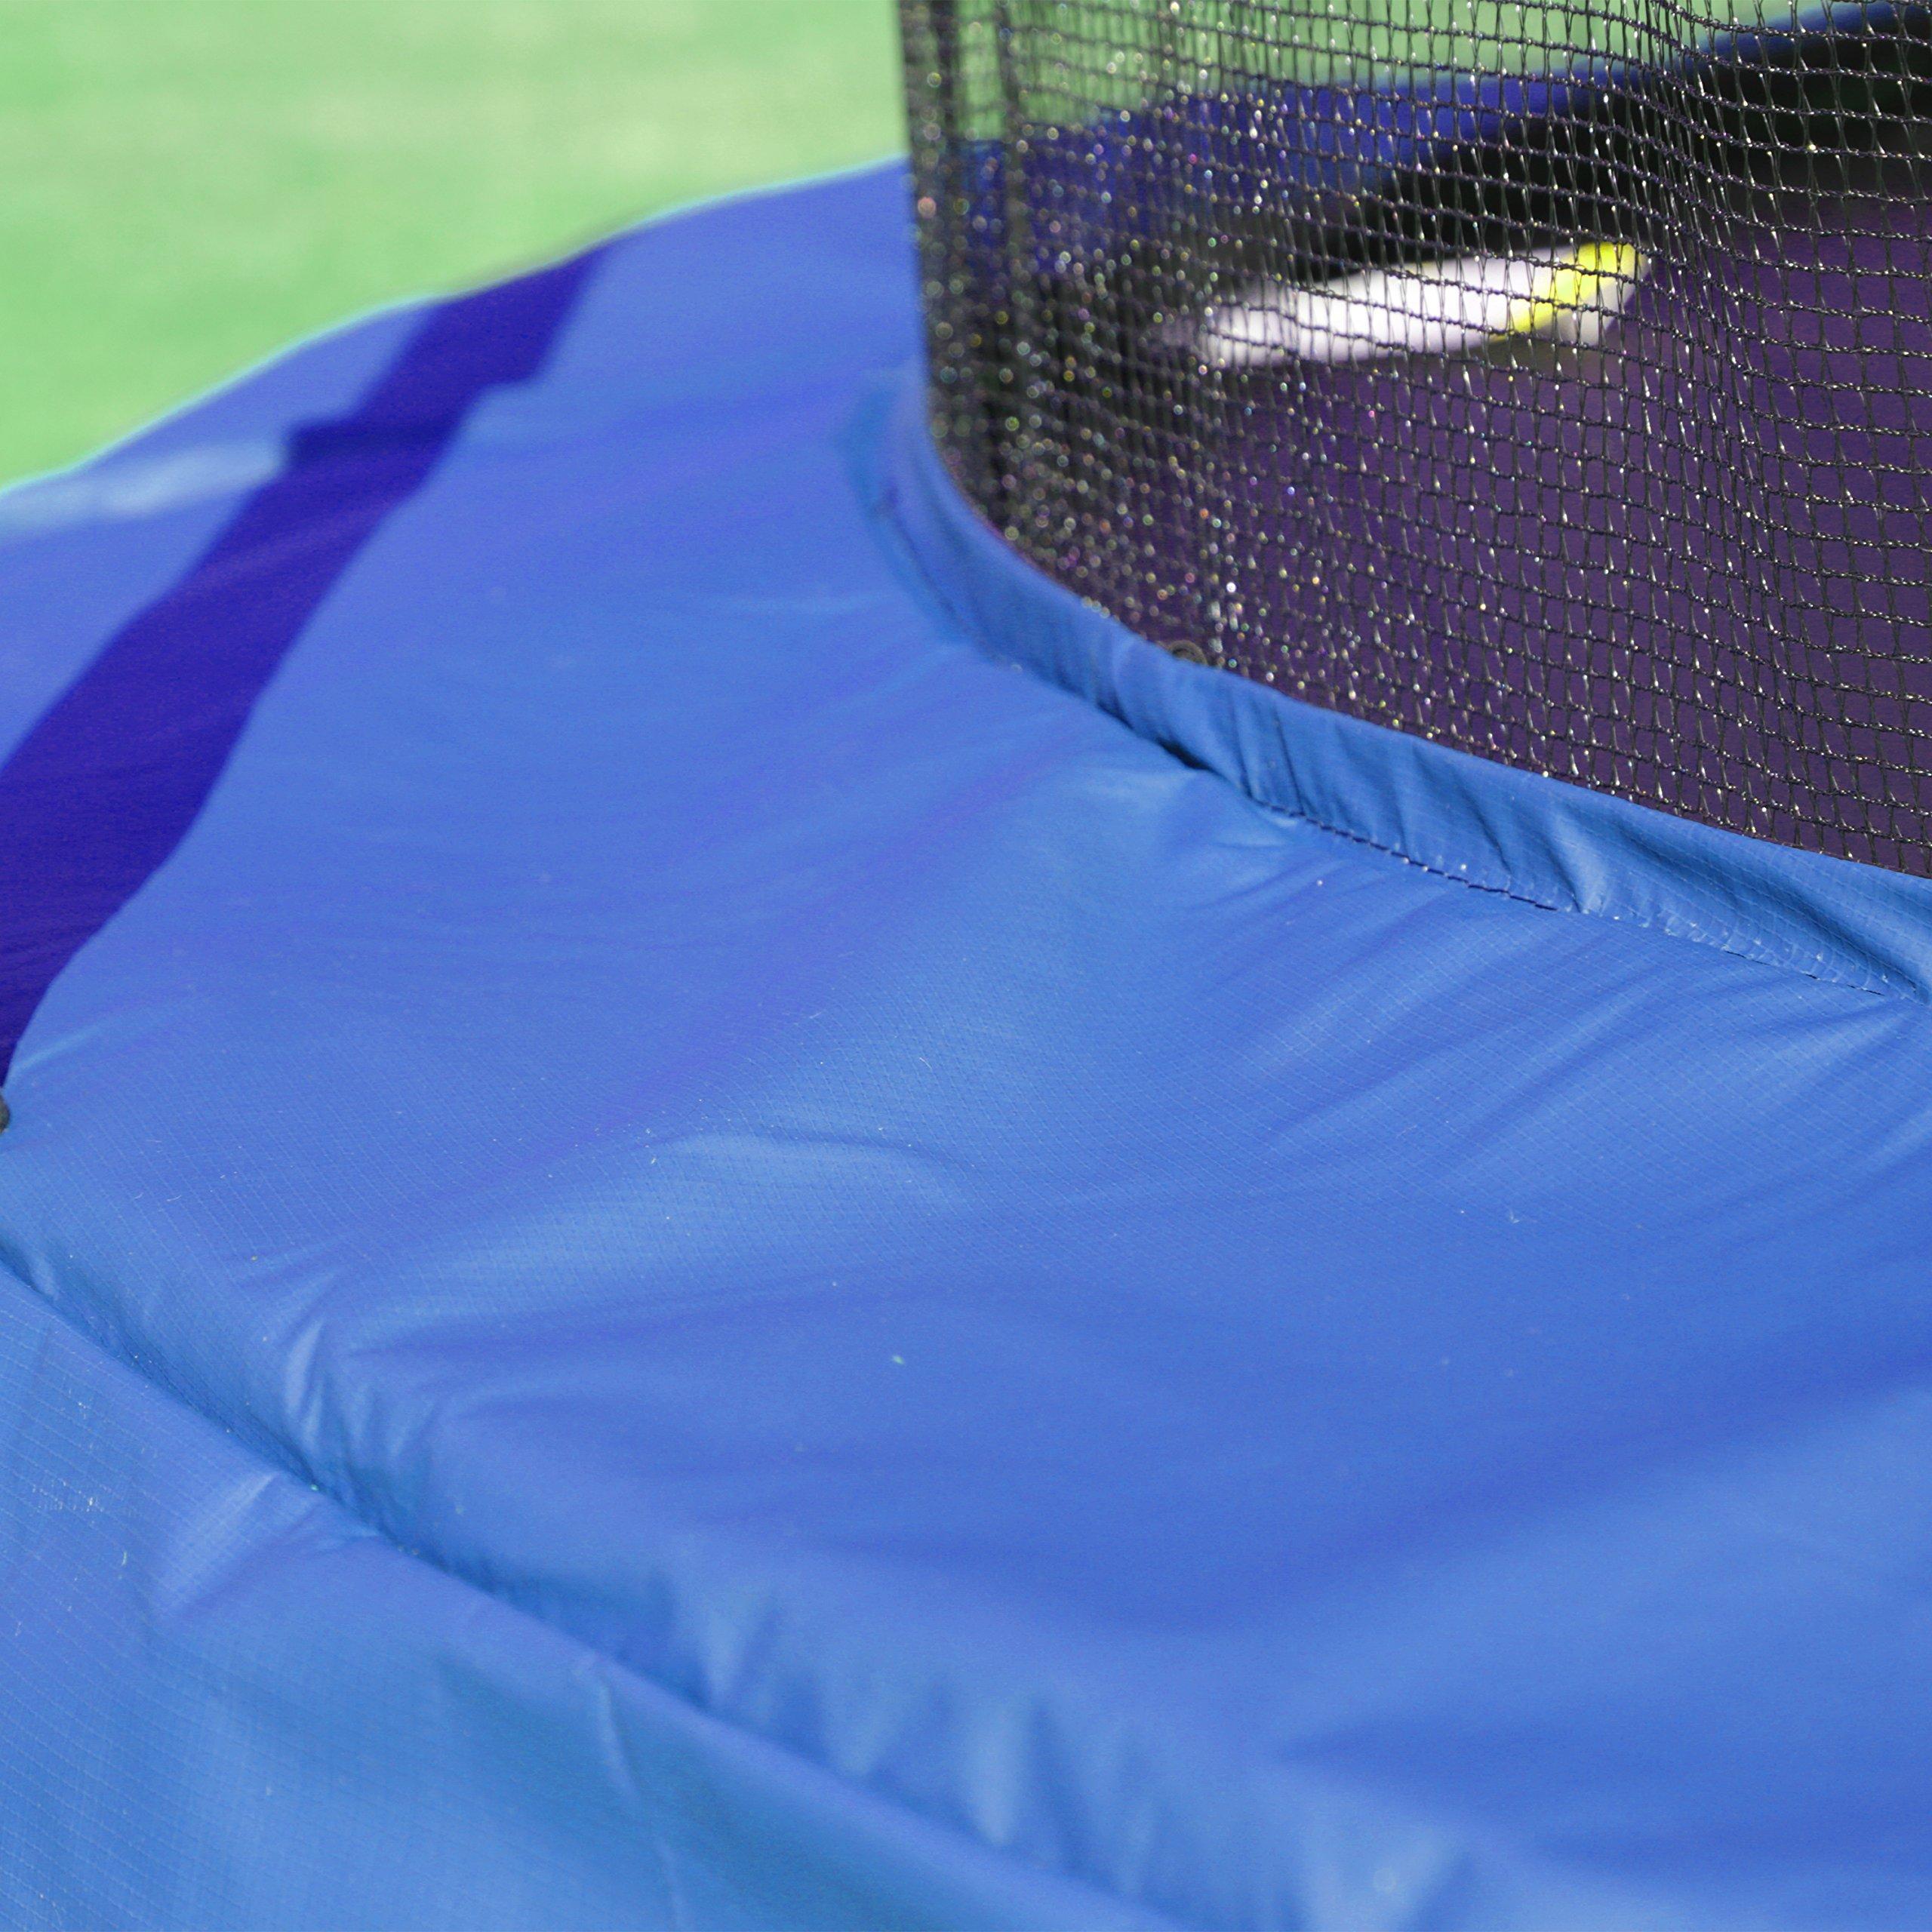 Skywalker Trampolines 10 -Foot Round Trampoline and Enclosure with spring, Blue by Skywalker Trampolines (Image #8)